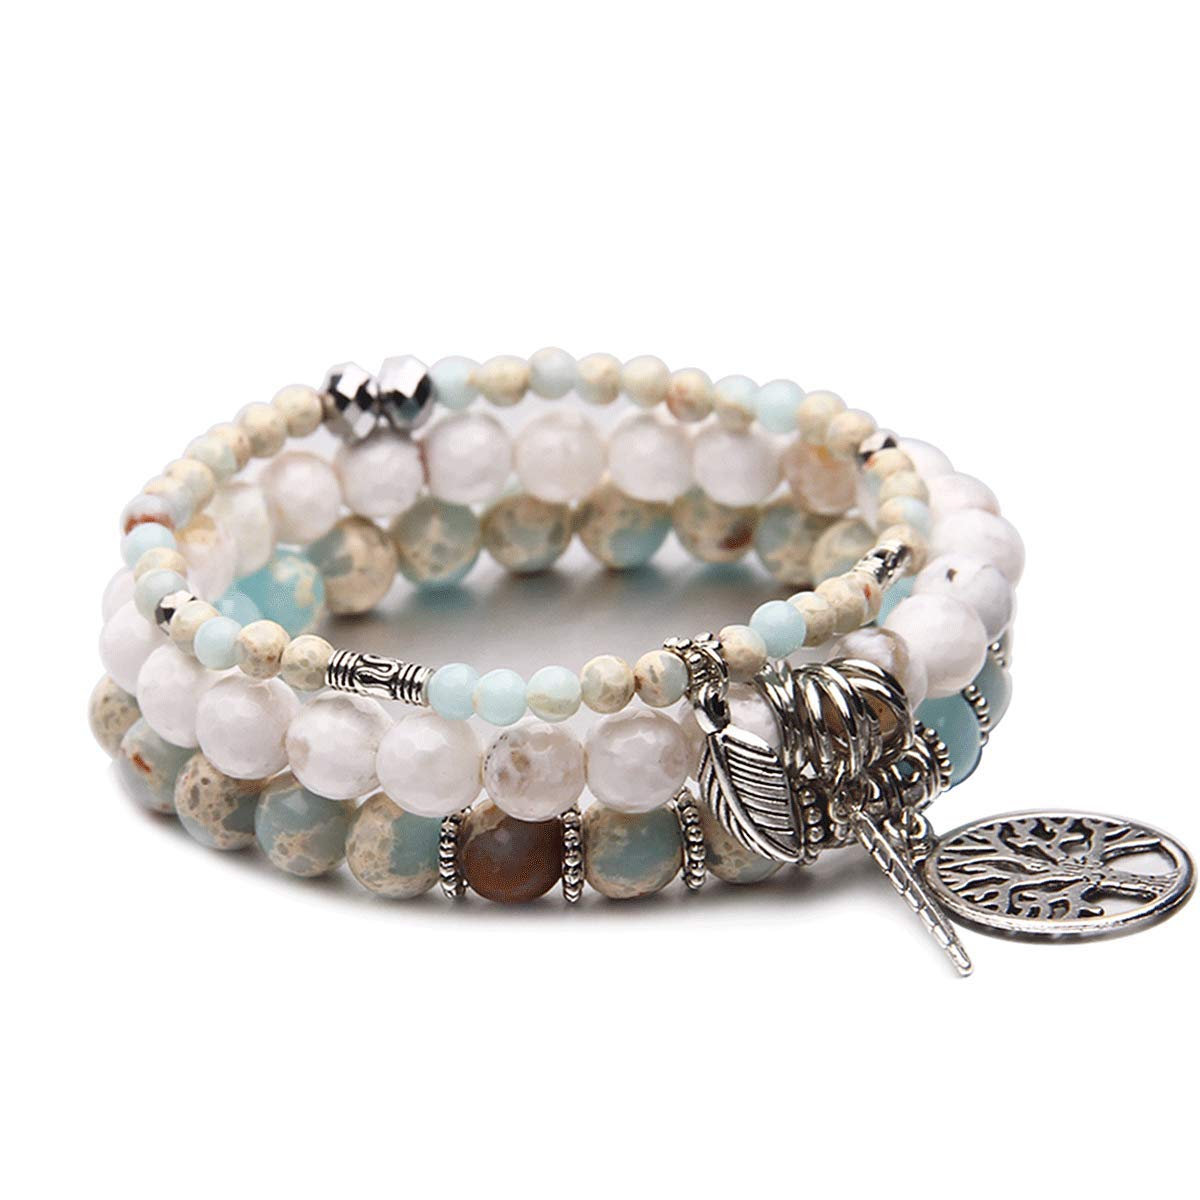 Tree of Life Turquoise Jasper & Tibetan Agate Gemstone Chakra Beaded Bracelet | Beach Charm Bracelet Set - Ocean Jewelry (Sky Blue)